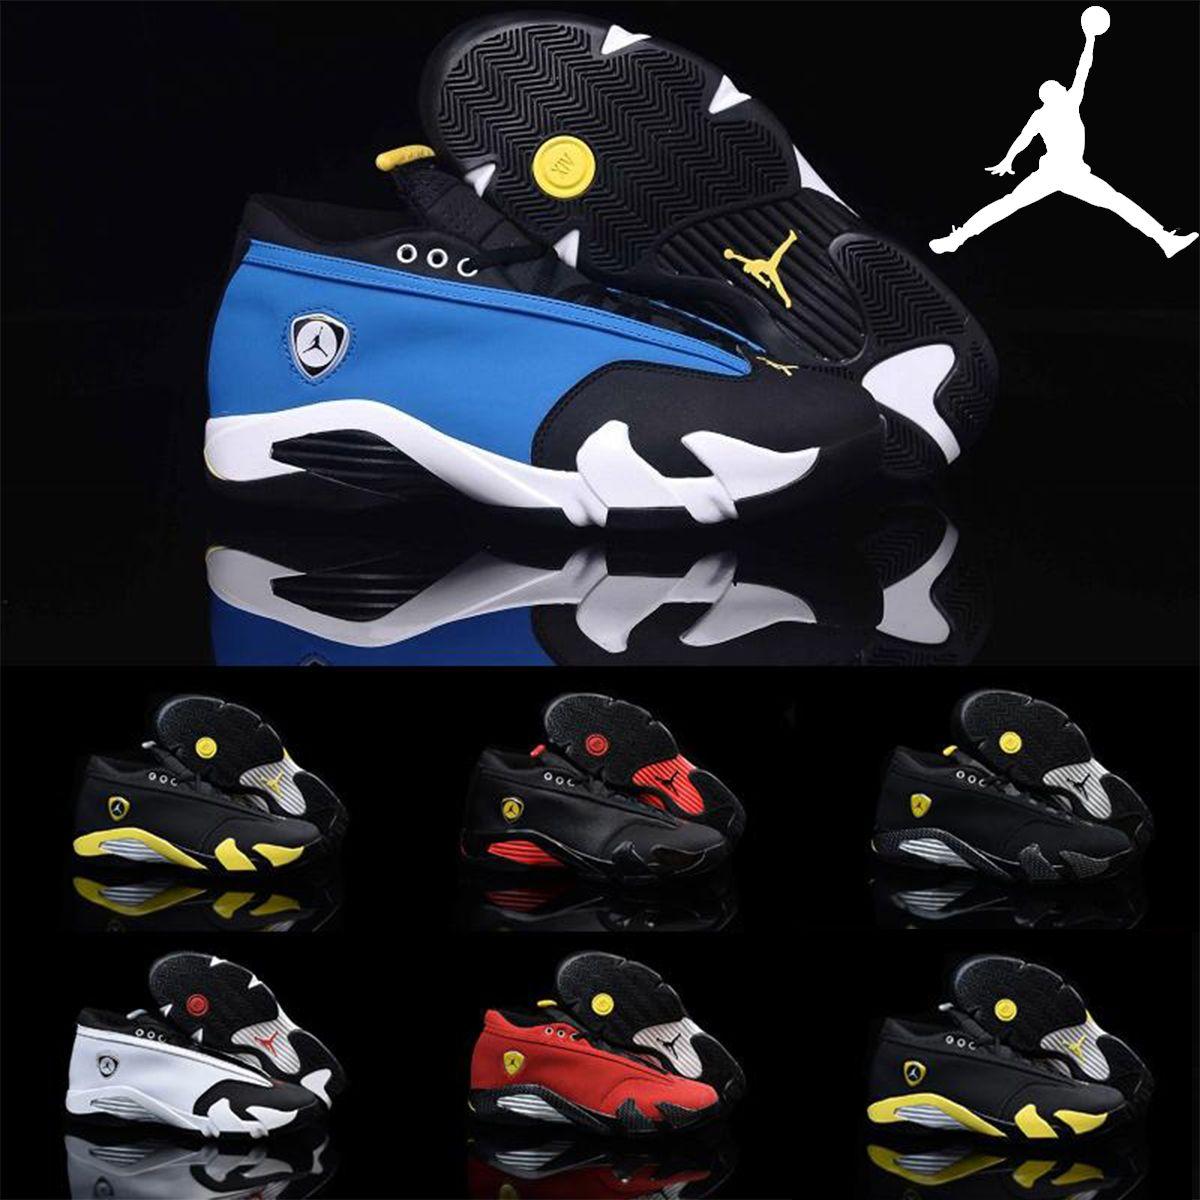 low priced 787a0 dbc45 Nike Air Jordan 14 Retro Low Laney Royal Blue 807511 405 Mens Basketball  Shoes,Brand New AJ14 Retro 14 XIV Sneakers J14s Low 36 47 Shoes Canada  Carmelo ...